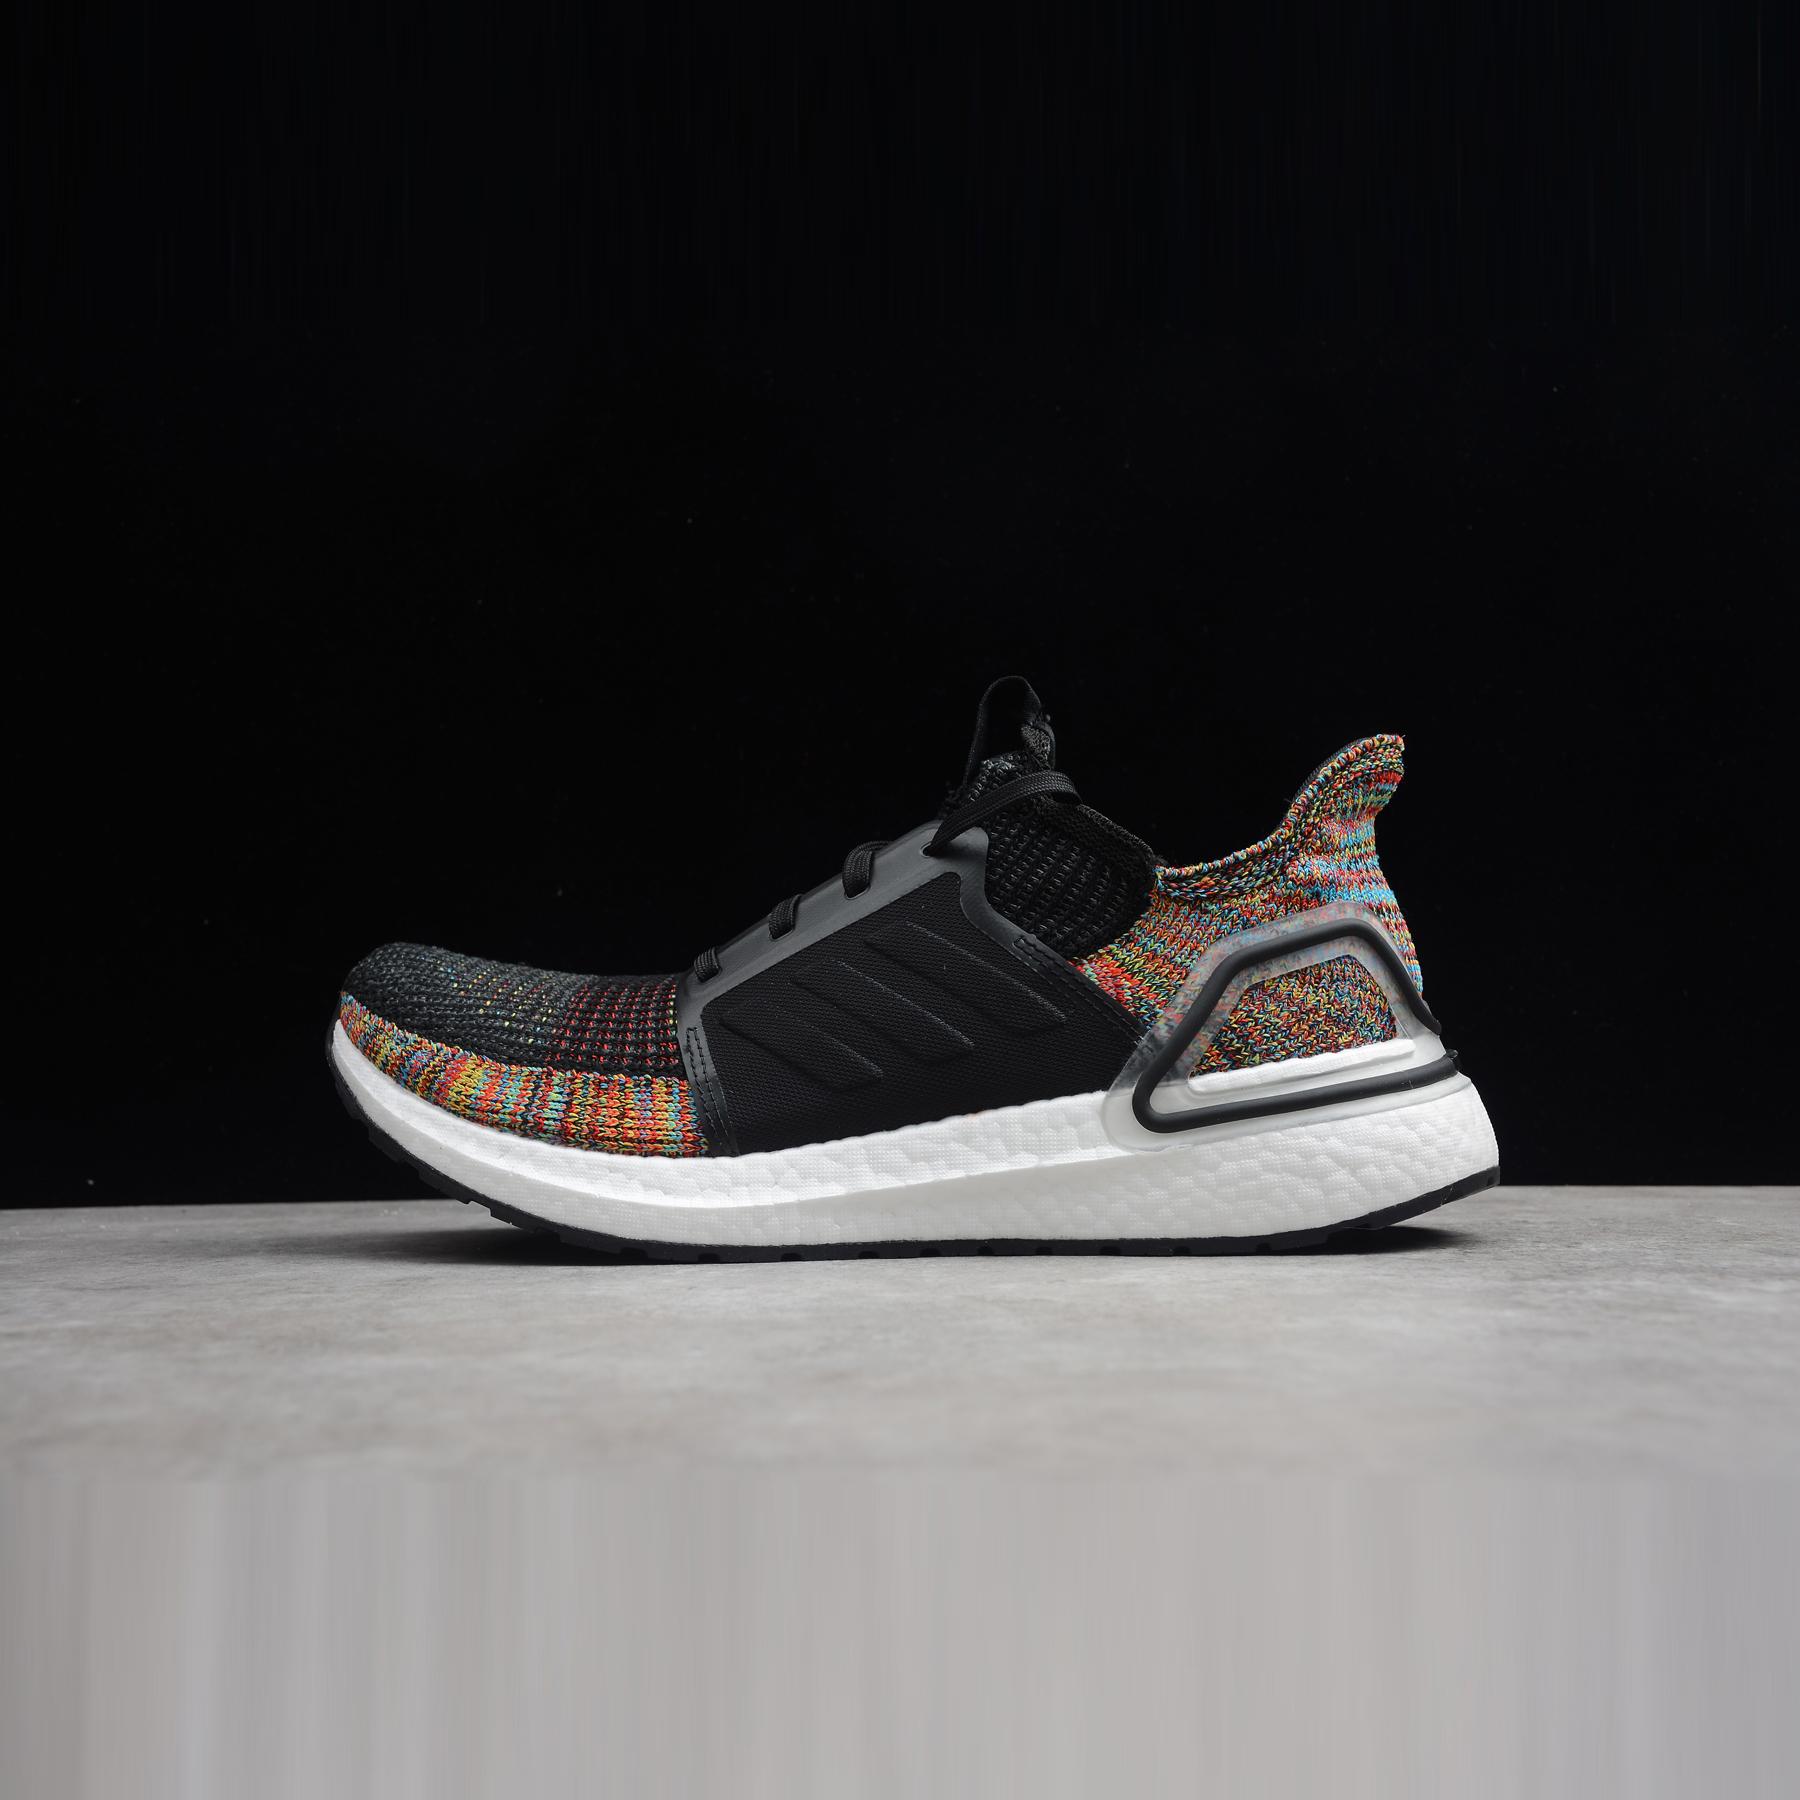 391deae64 Adidas UltraBoost 19 · Newest Arrivals · Testimonials · 0. Previous